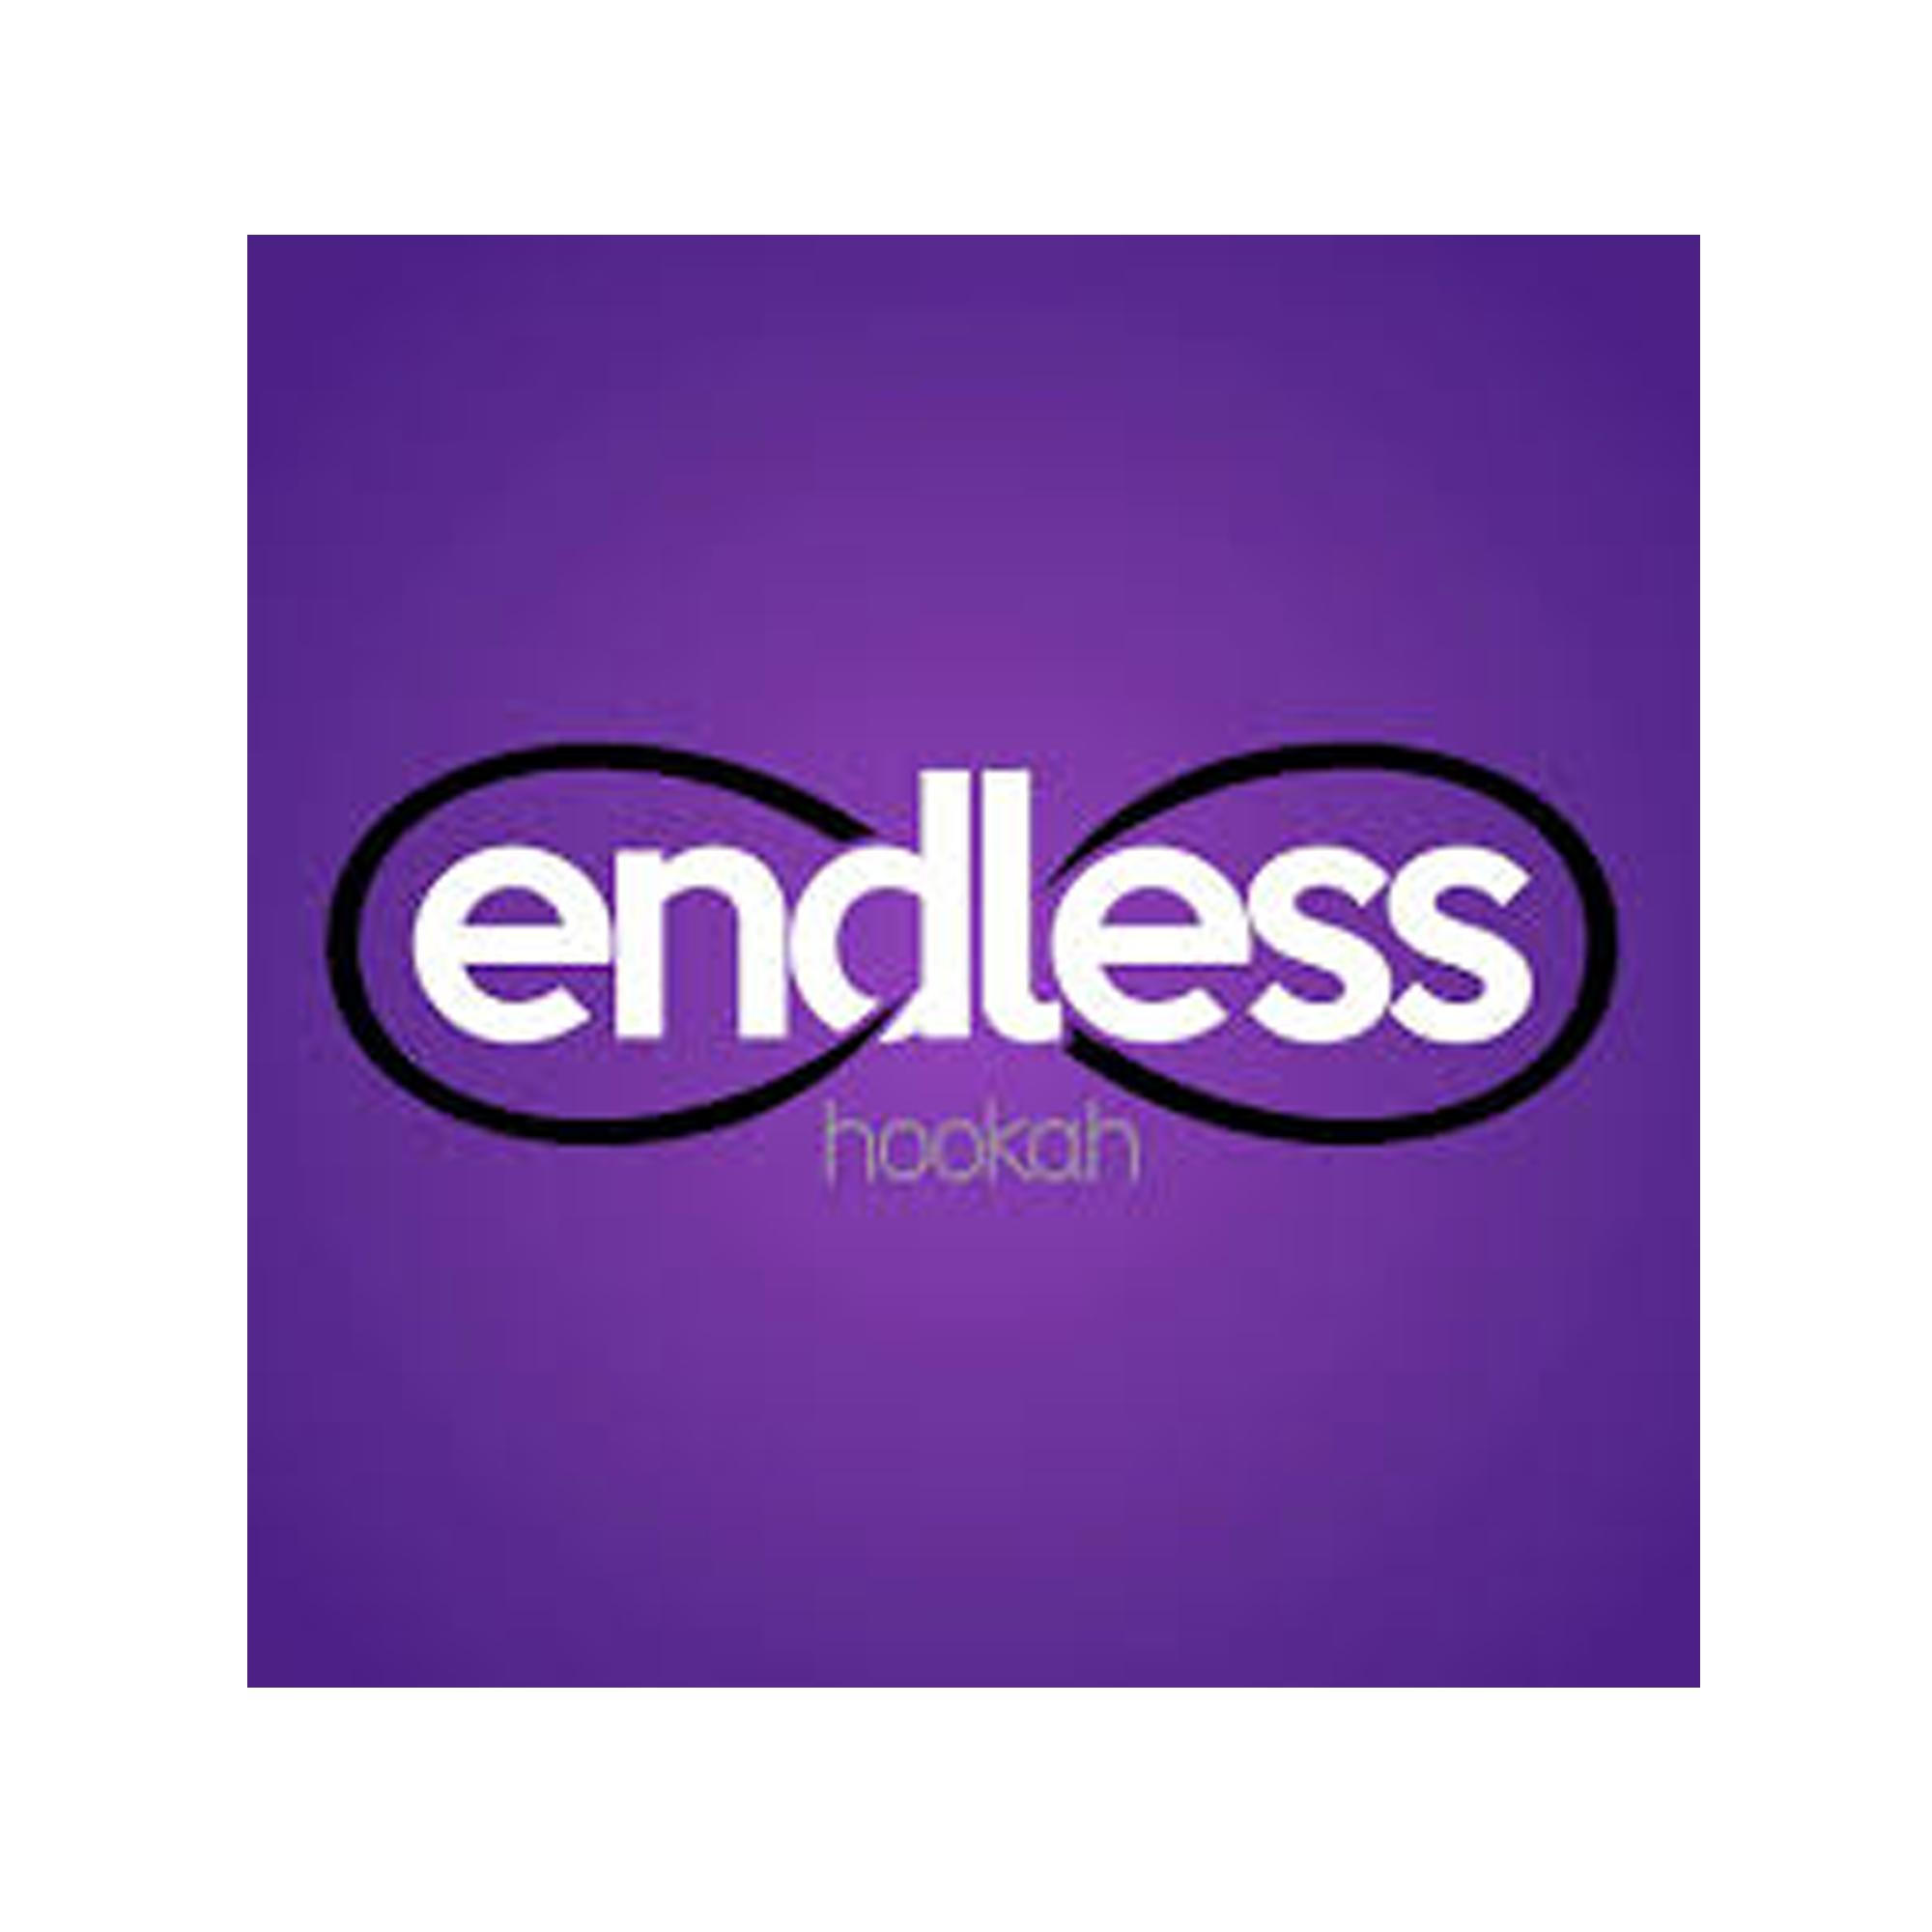 Endless Hookah